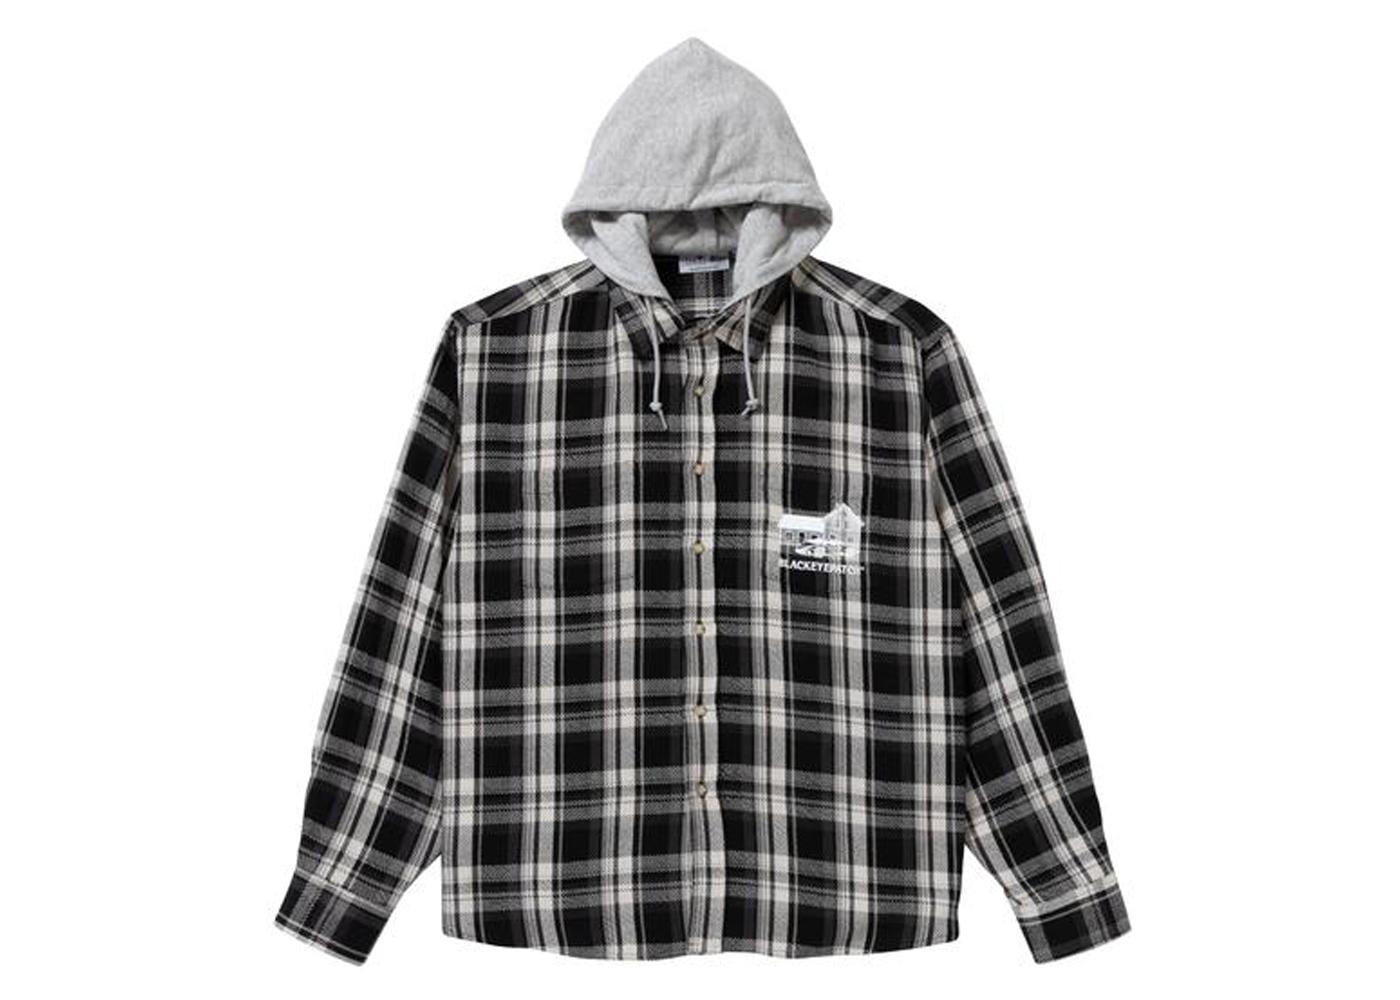 The Black Eye Patch Hooded Flannel Shirt Black / Gray (FW21)の写真